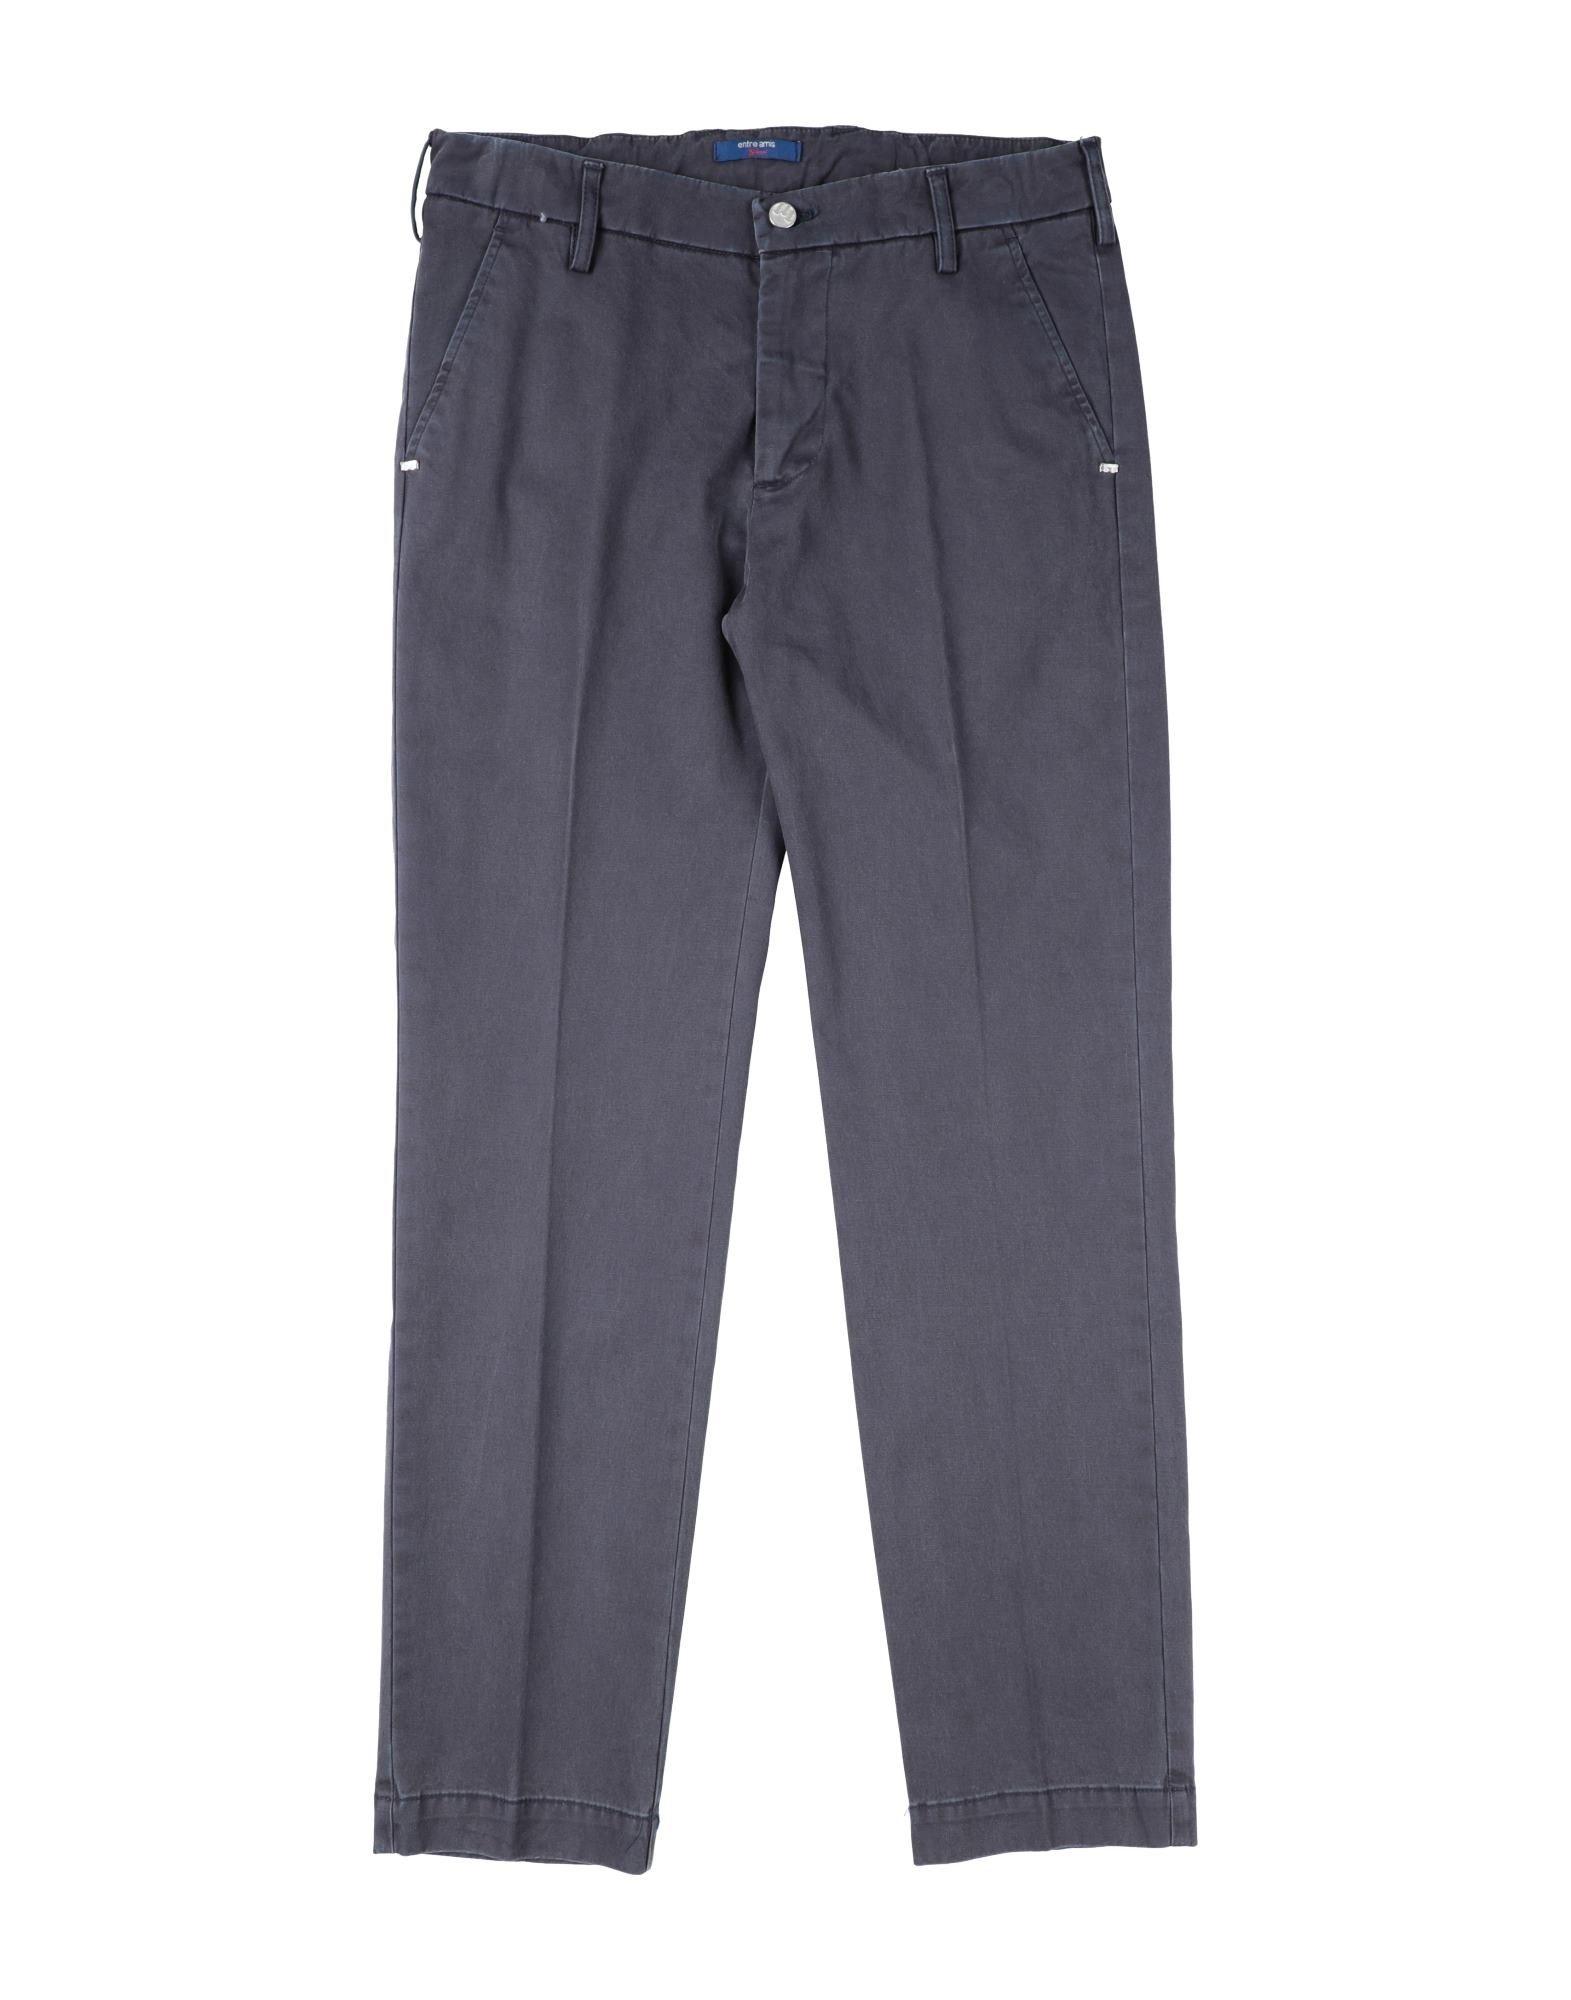 Entre Amis Garçon Kids' Casual Pants In Dark Blue